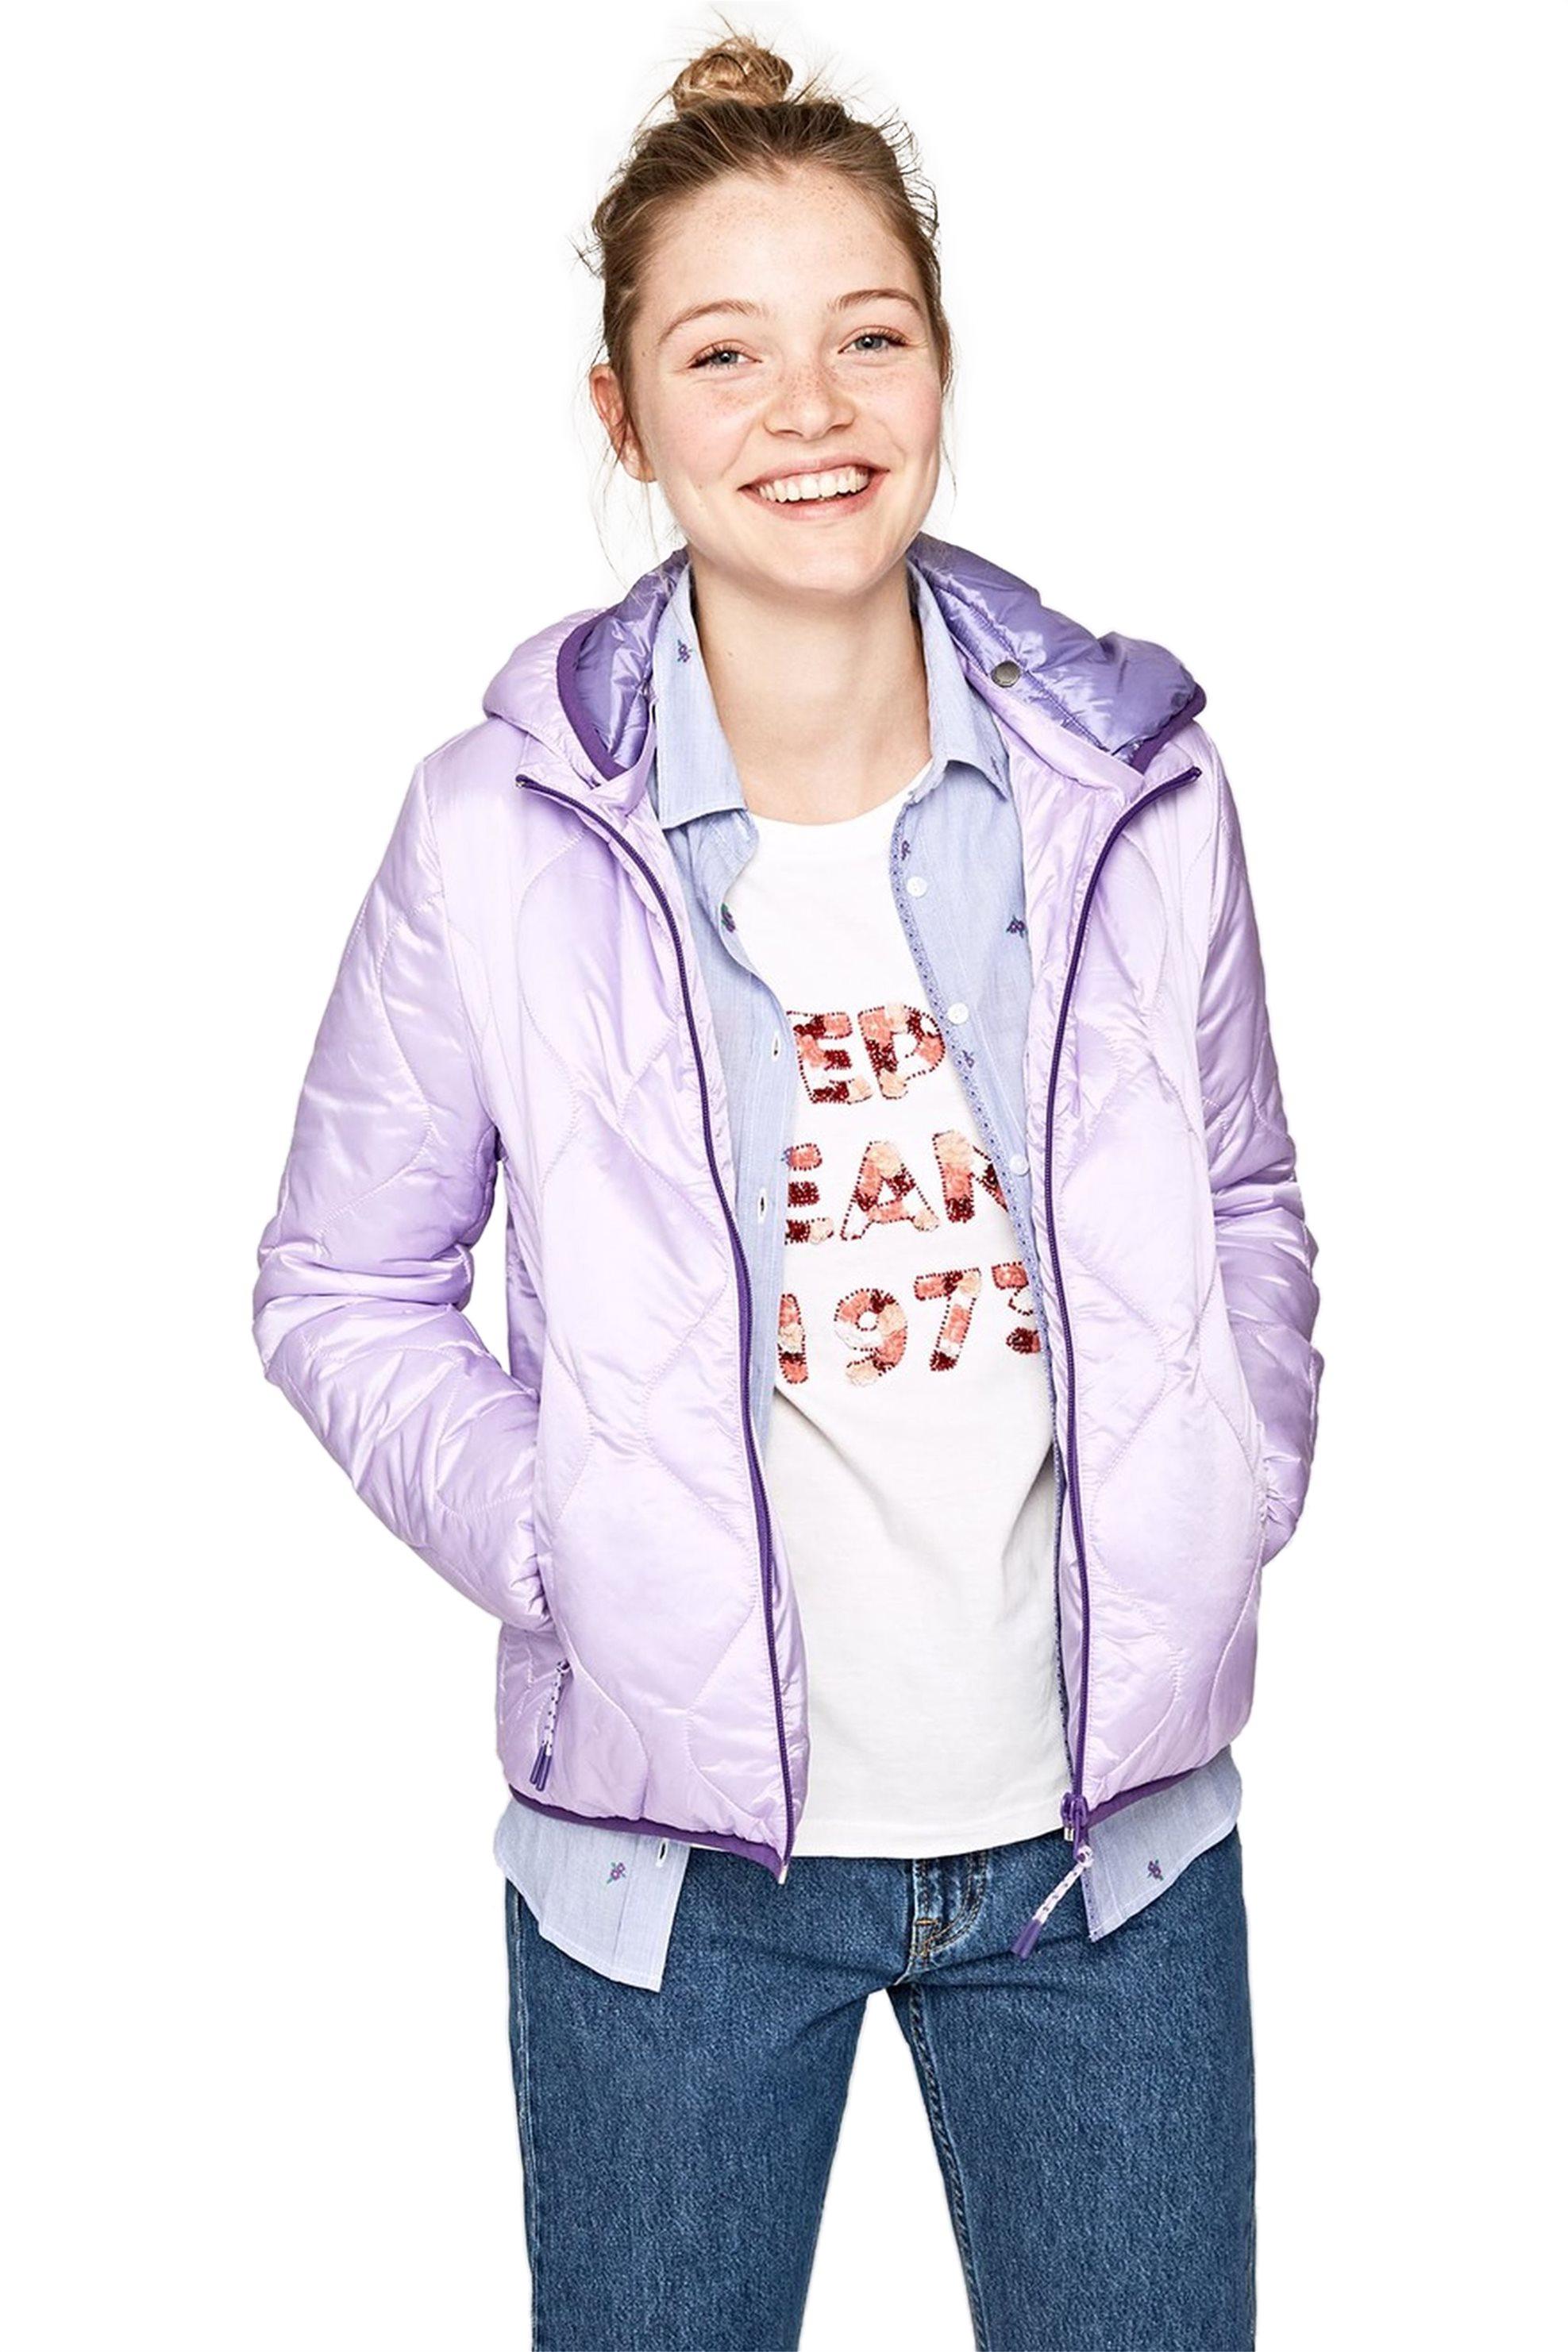 689d7d0e3f9 Pepe Jeans γυναικείο καπιτονέ μπουφάν με κουκούλα Mathilde - PL401585 - Λιλά